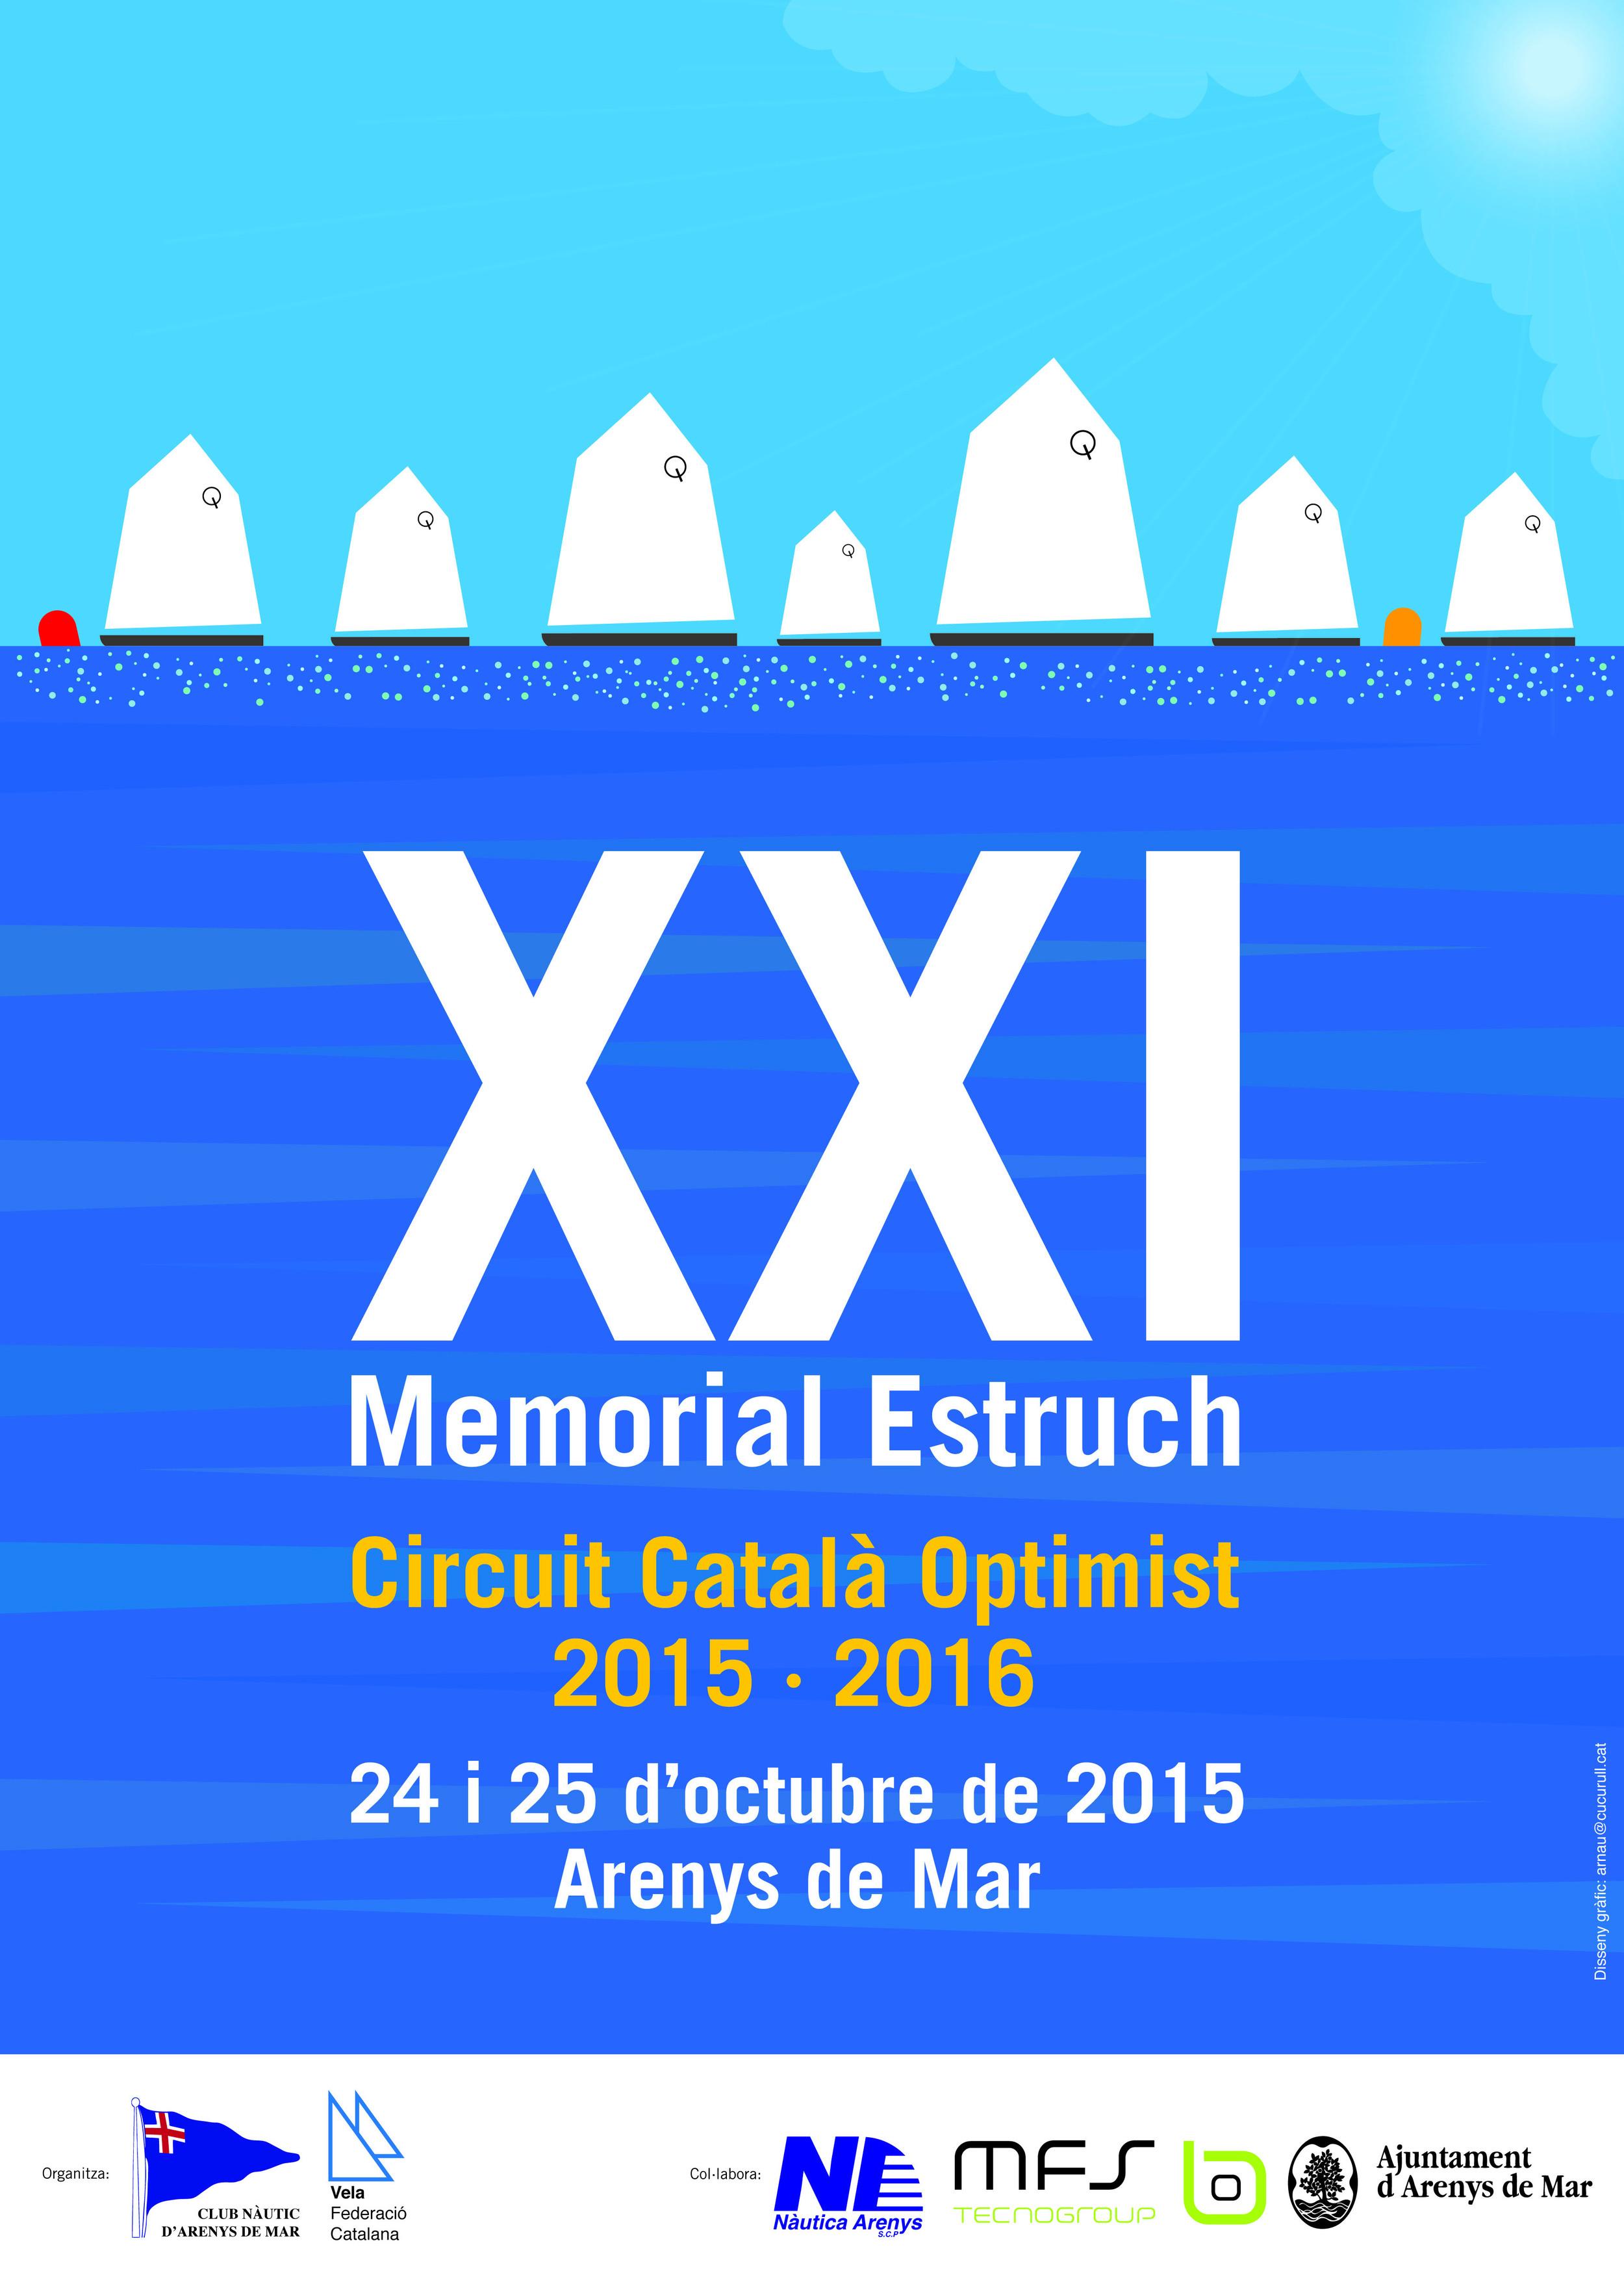 XXI Memorial Estruch